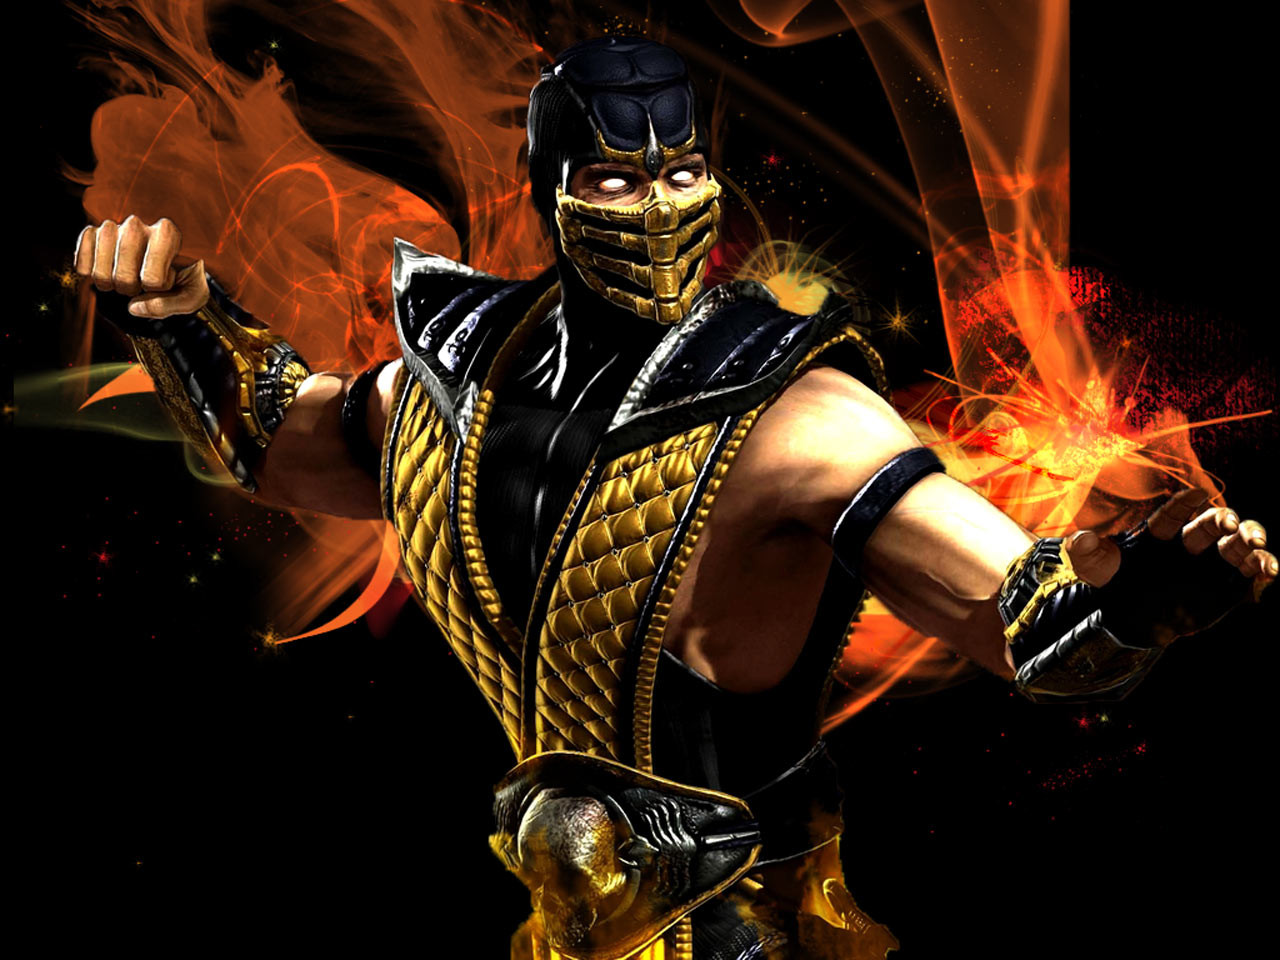 Showing Gallery For Scorpion Mortal Kombat Wallpaper 2011 1280x960